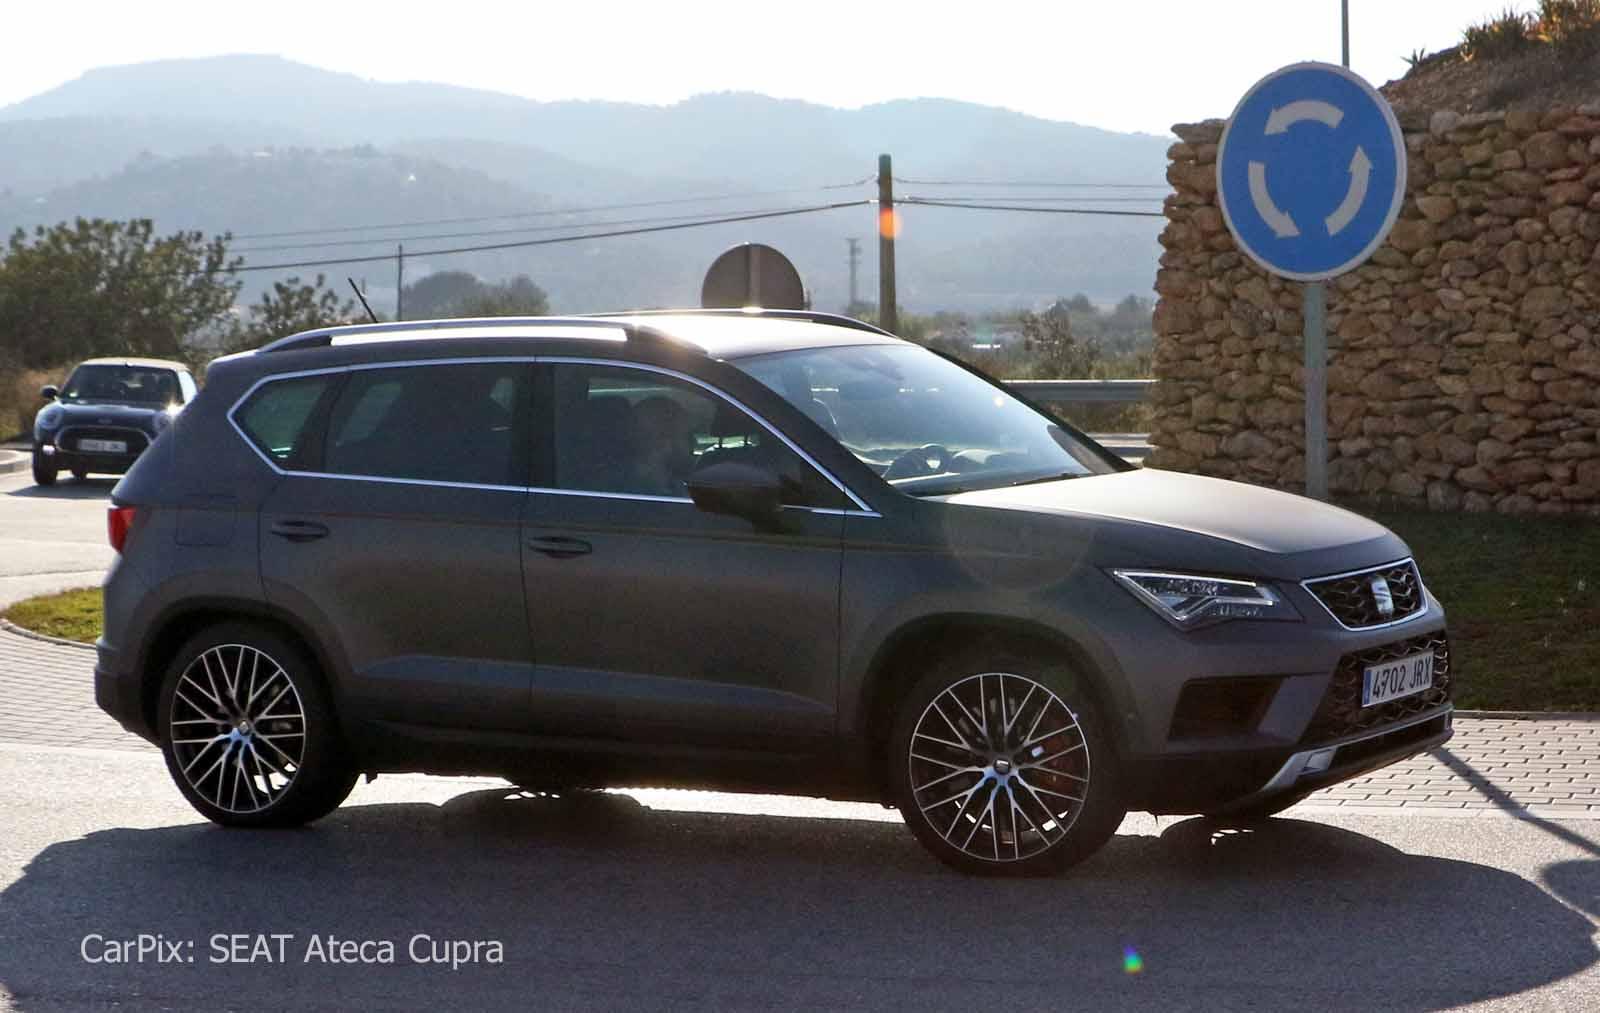 Seat-Ateca-Cupra-4